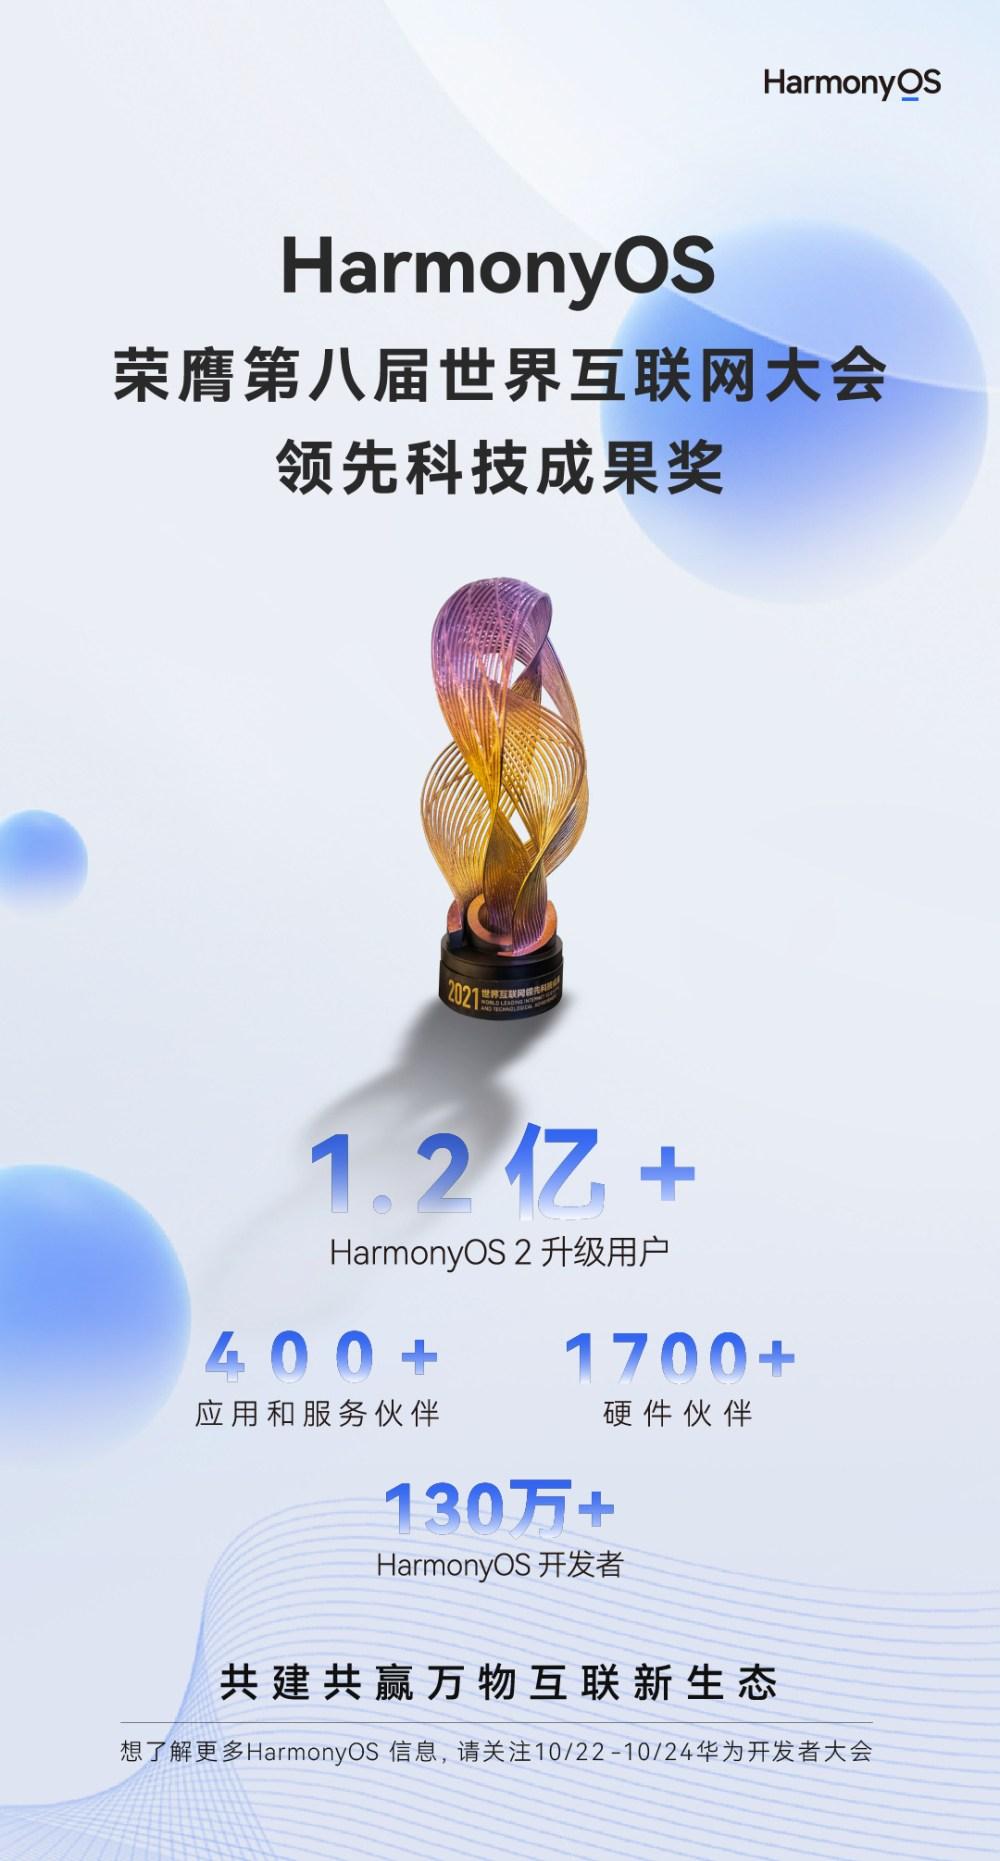 Huawei HarmonyOS won the Leading Technology Achievement Award